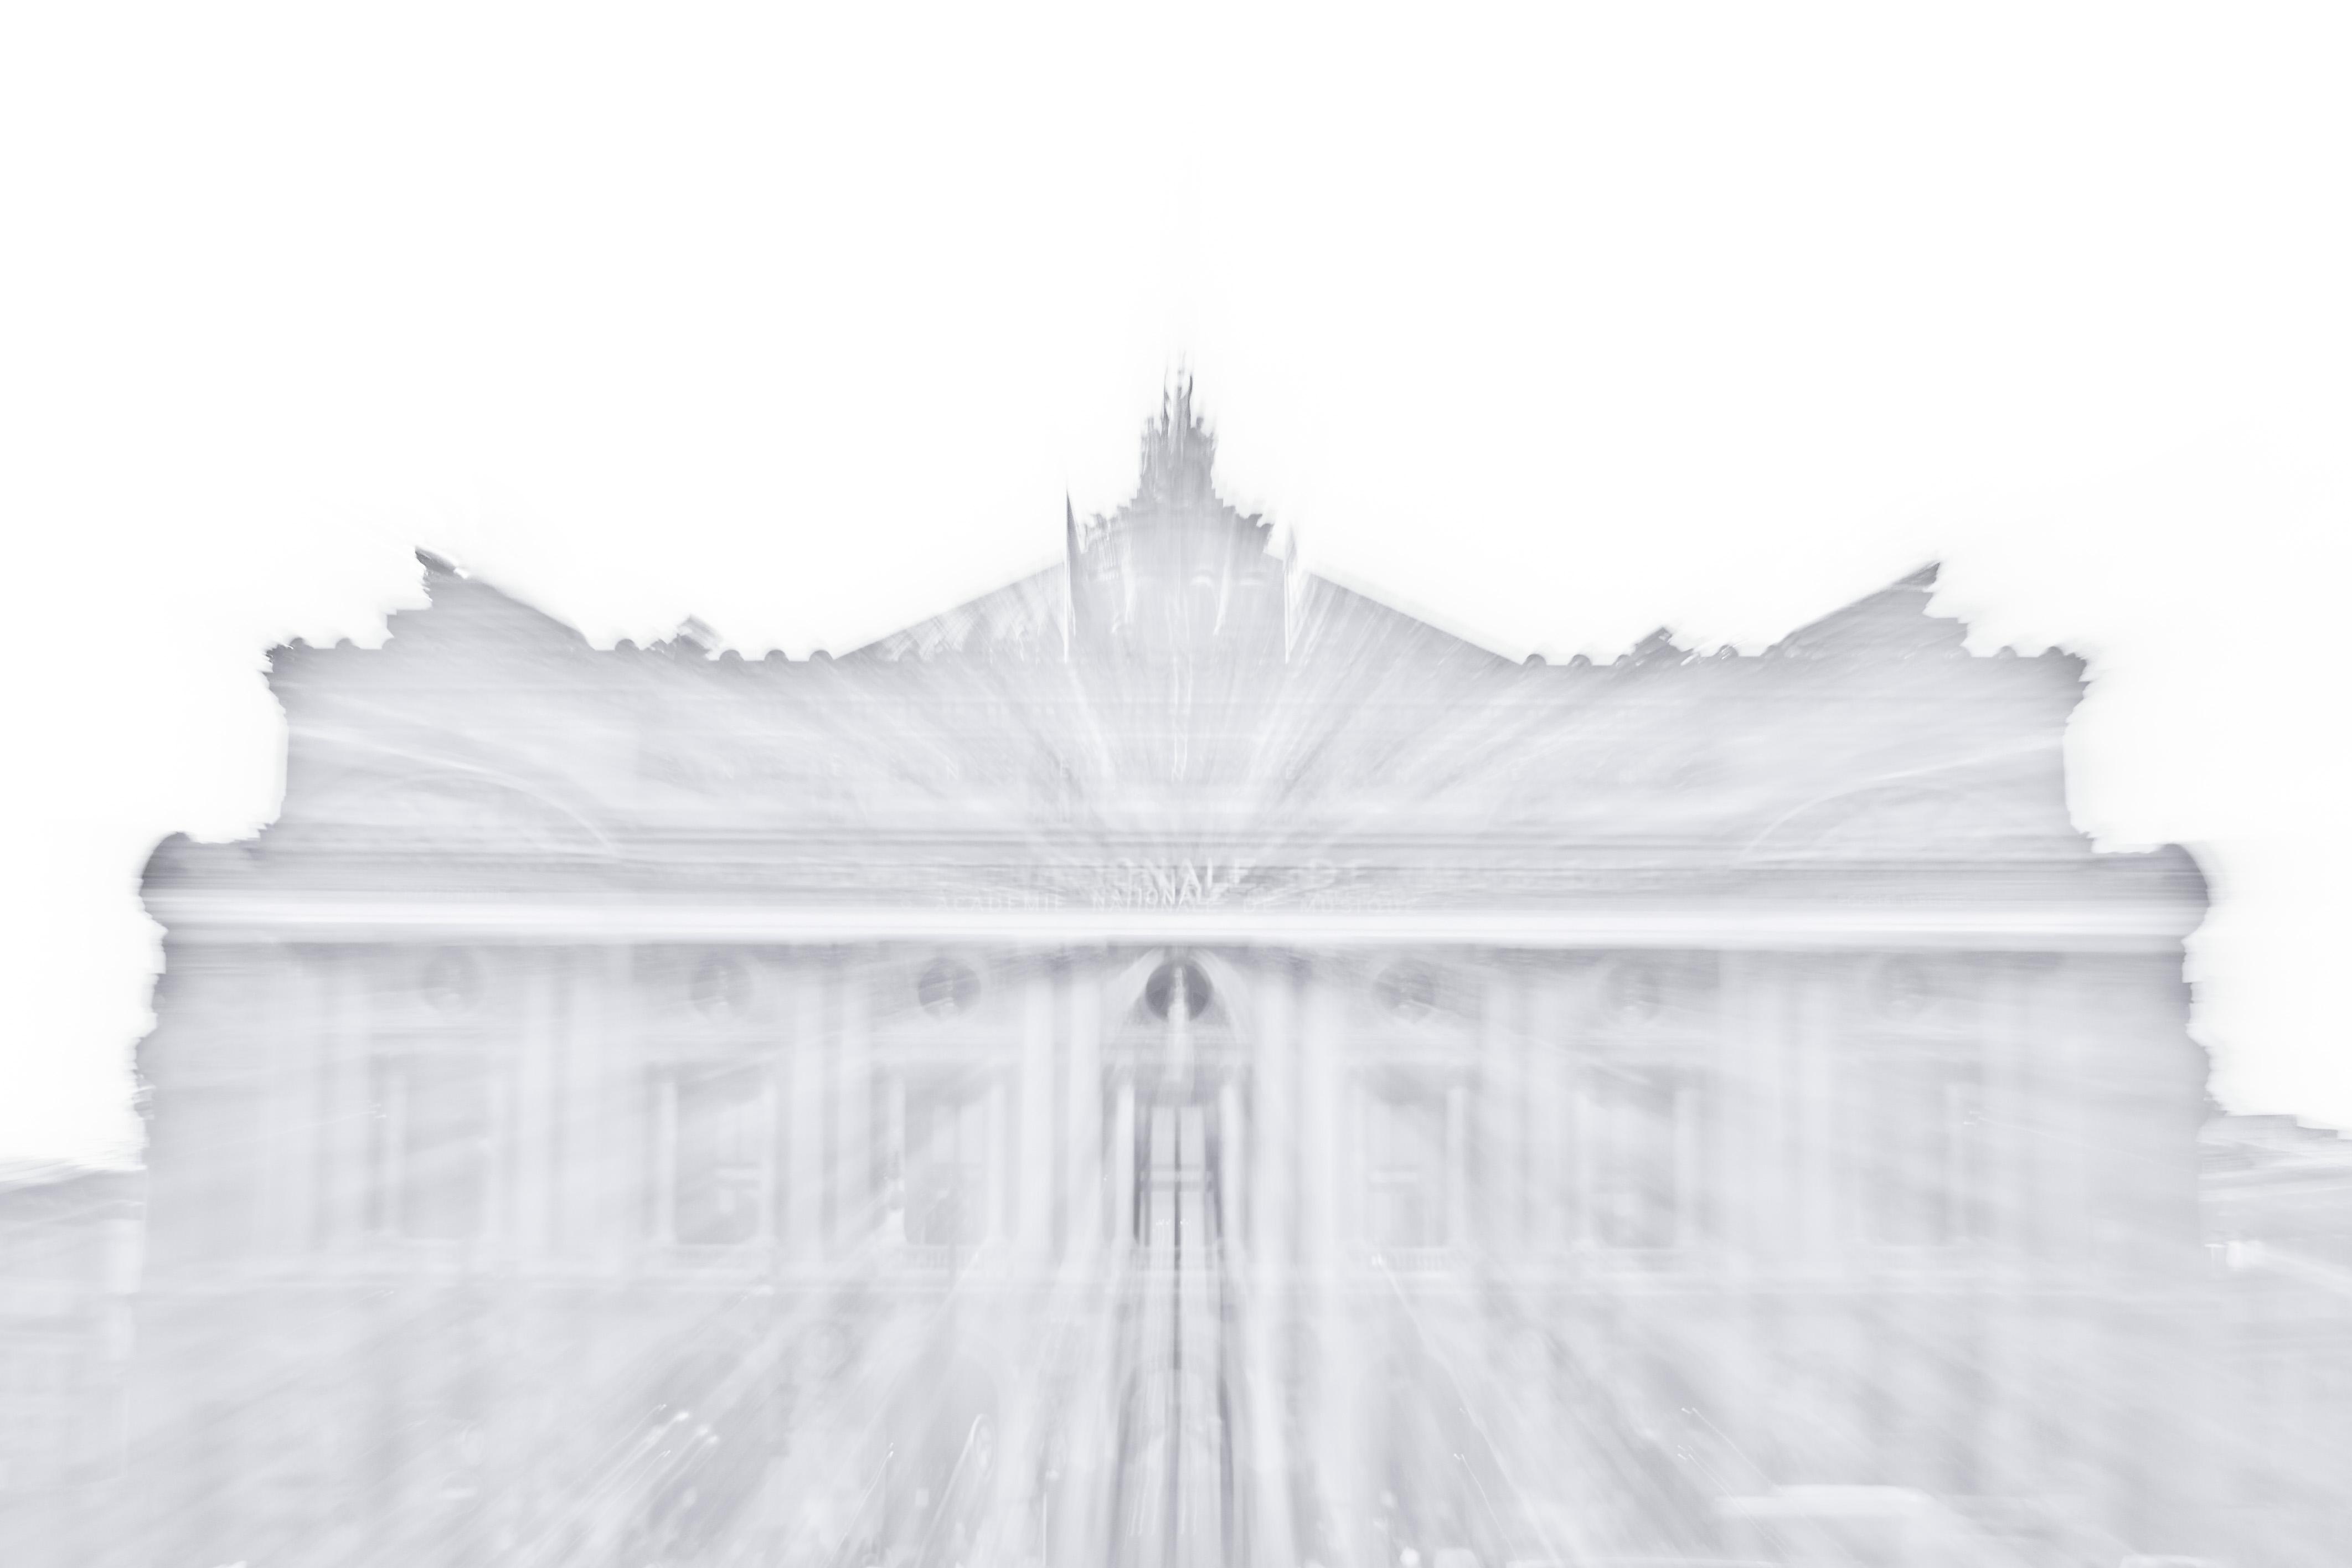 Garnier Palace Opera, Paris 2013